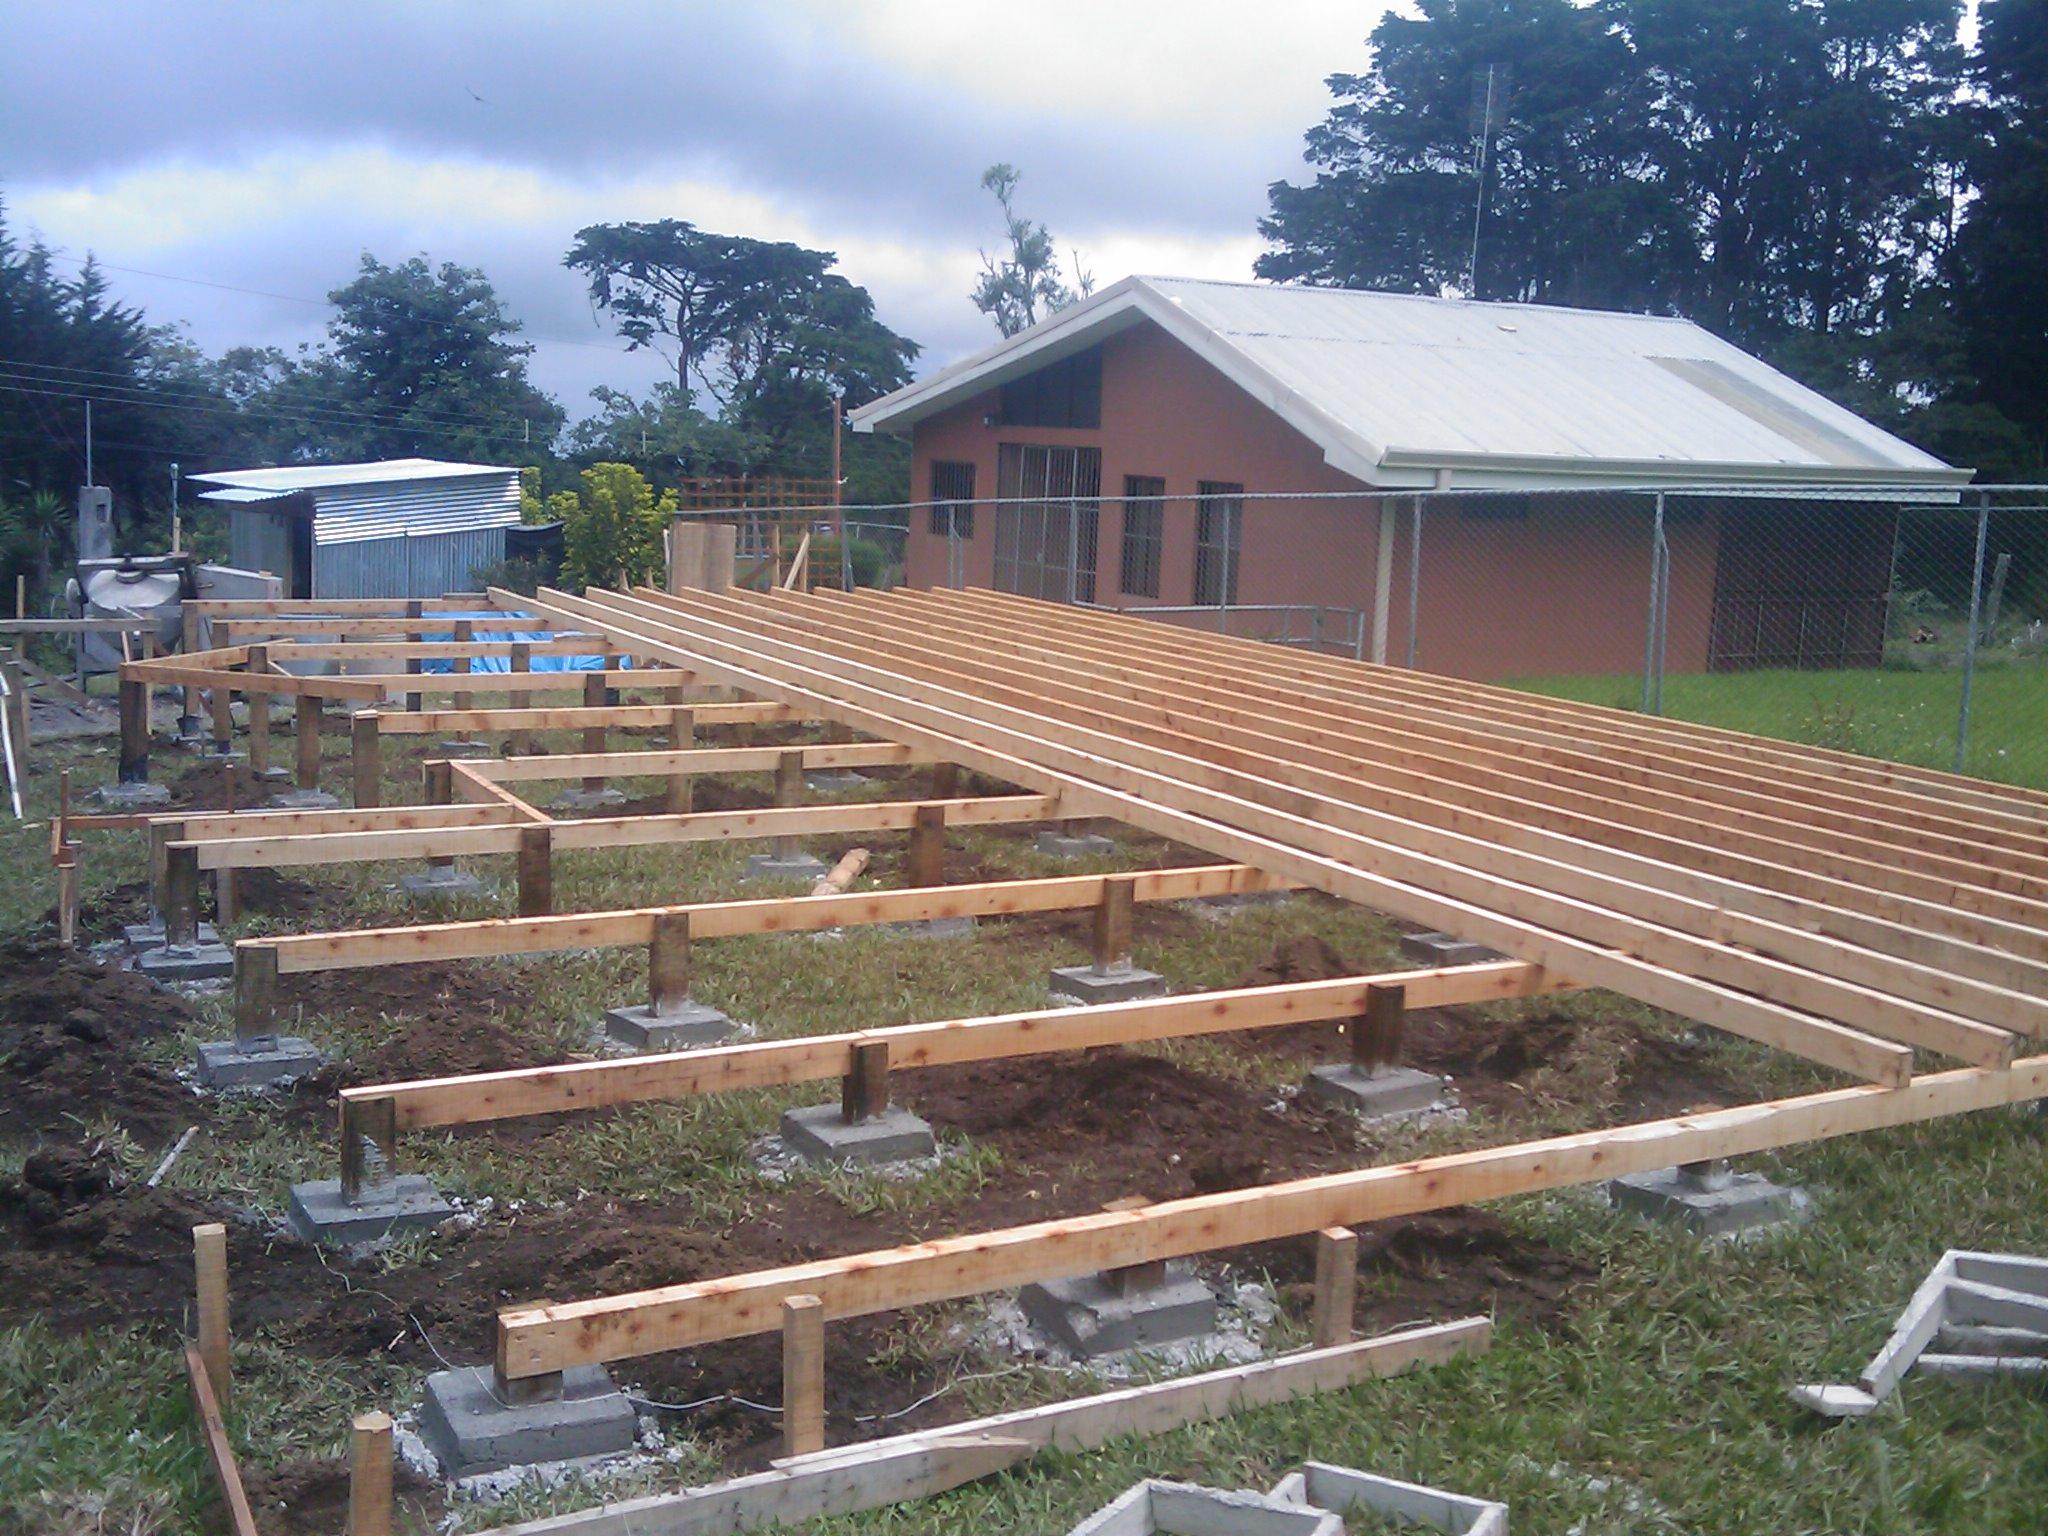 Construcci n caba a fh parte i ecoarqsos - Construccion de cabanas de madera ...